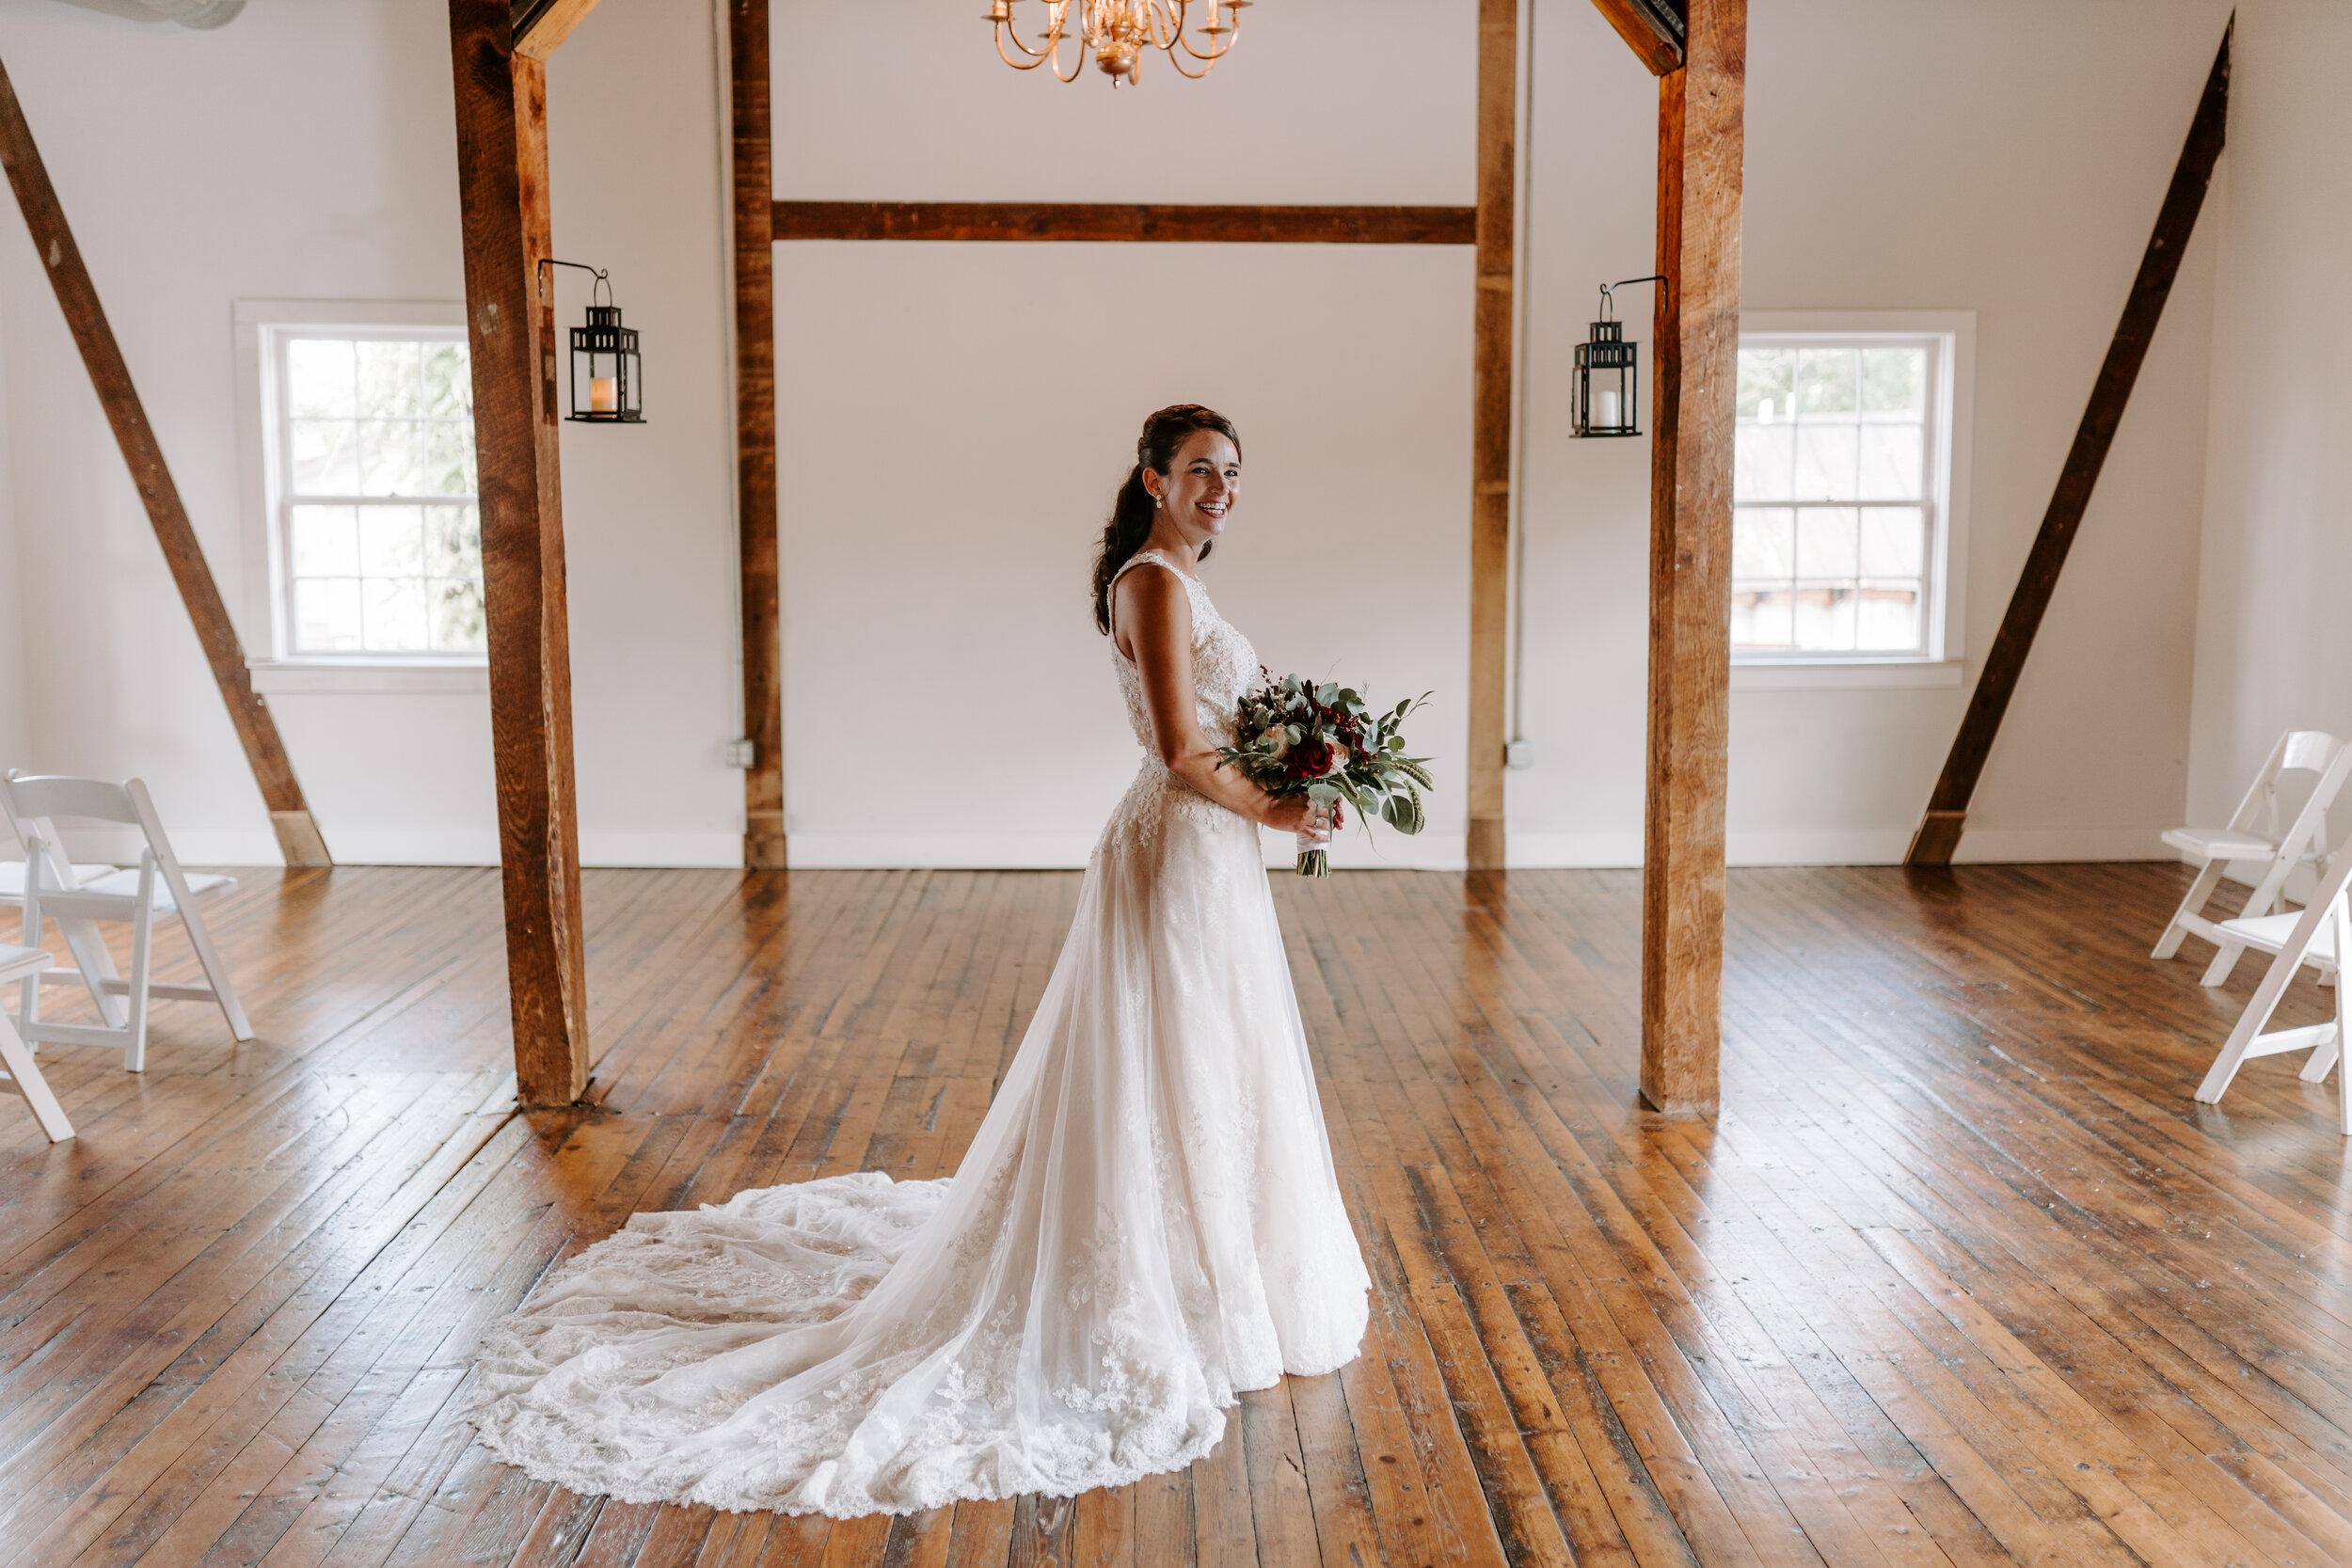 Bridal Portraits Session by Kayli LaFon Photography | Muse At The Mill wedding venue, Winston-Salem, NC